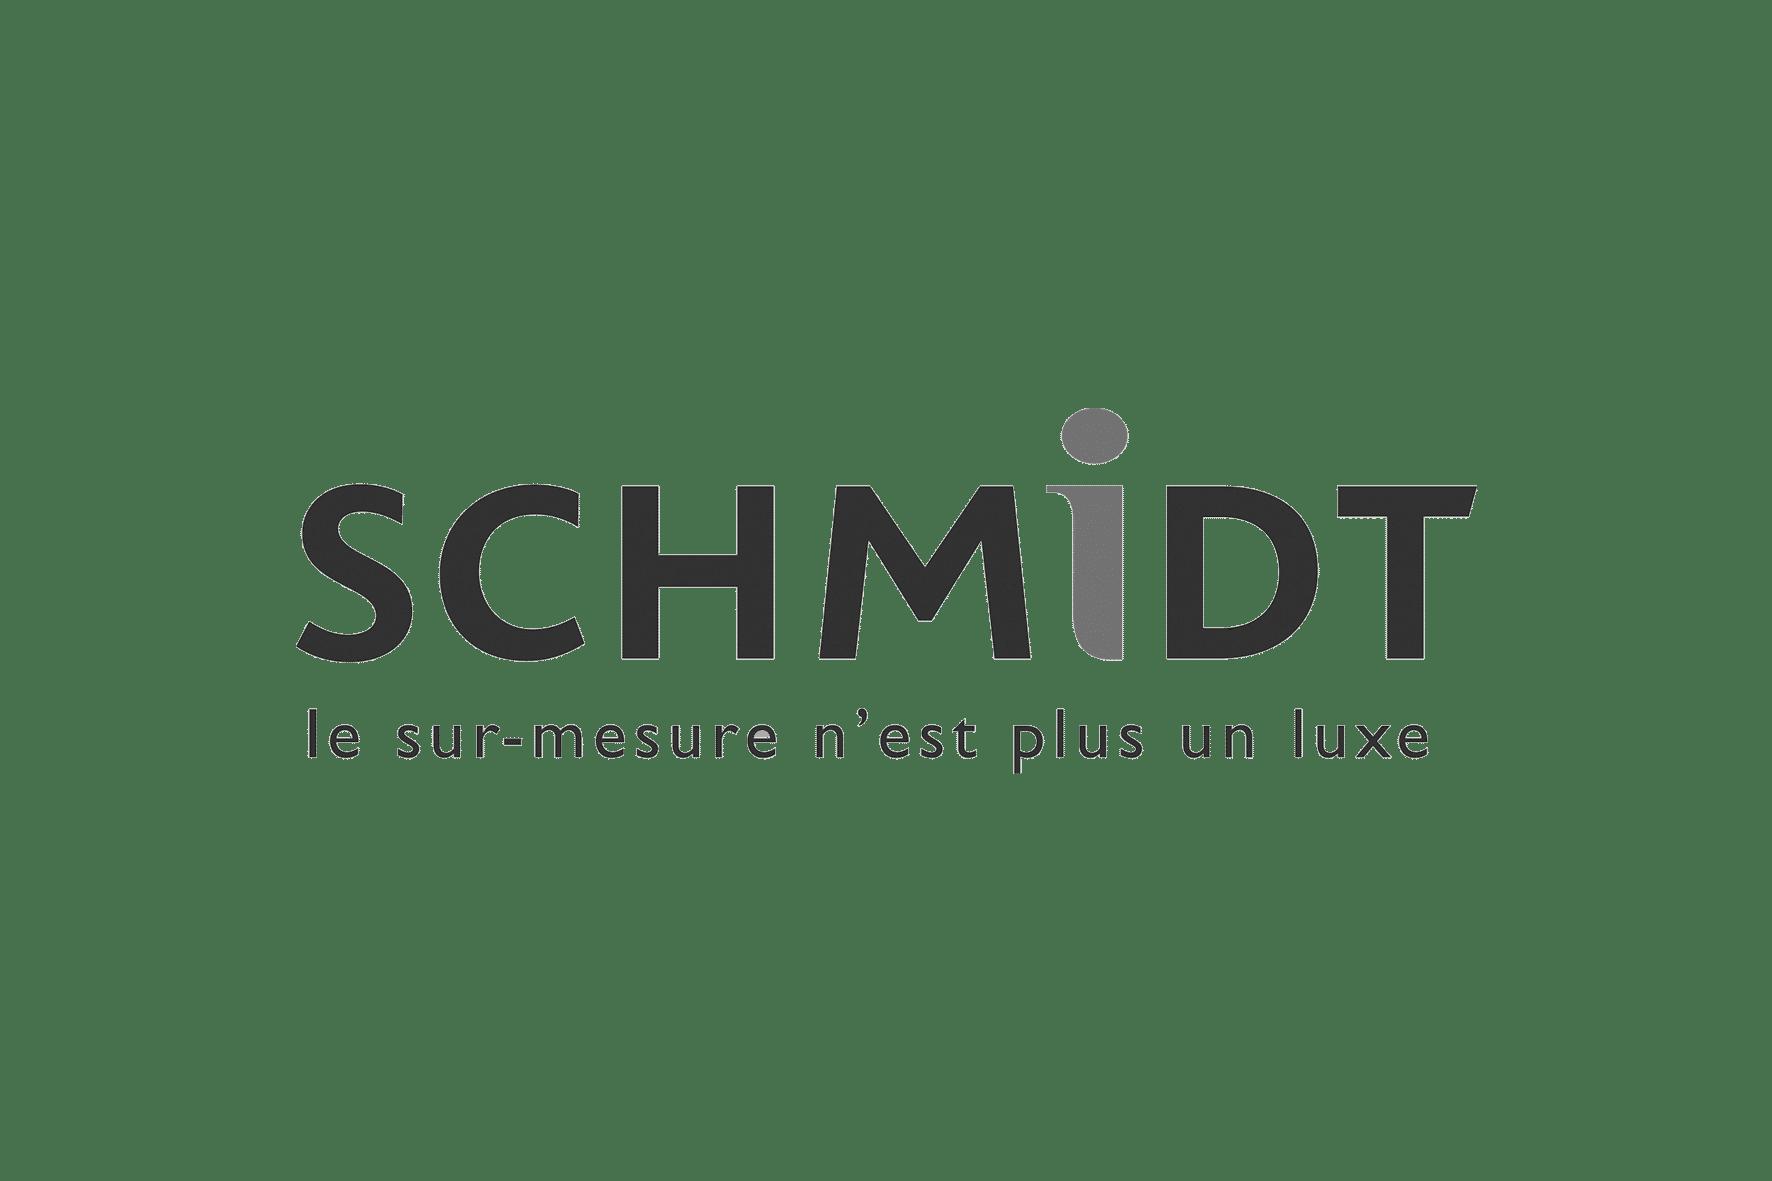 https://doubleve.fr/wp-content/uploads/2019/07/logo-schmidt.png